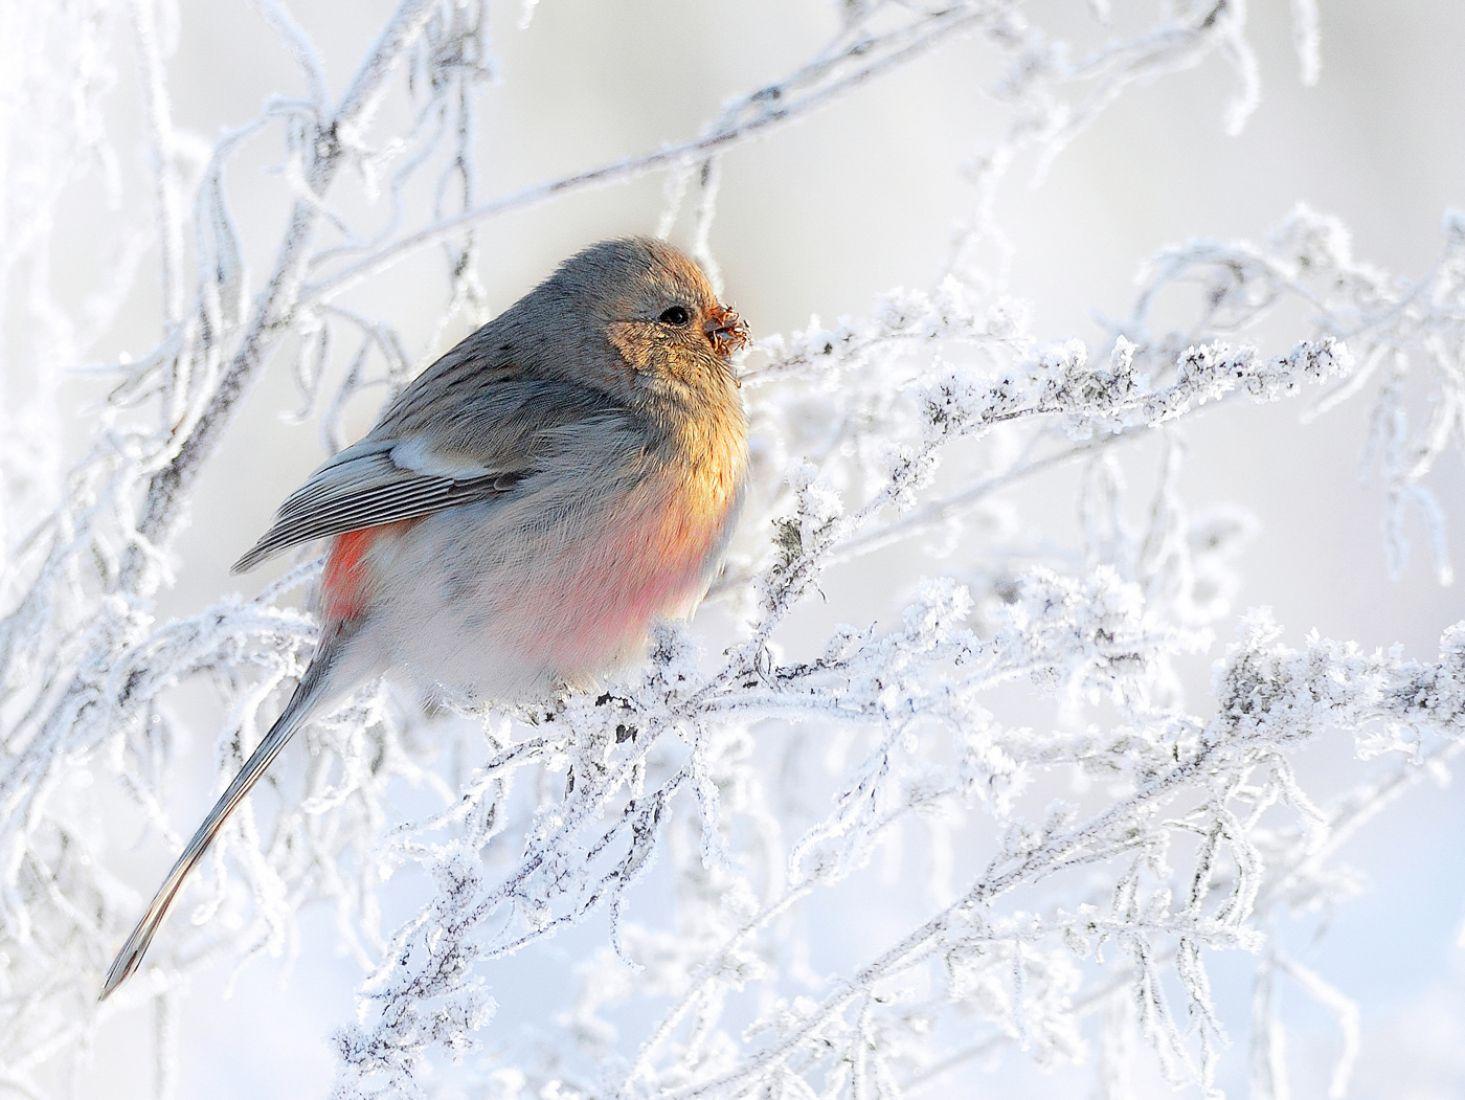 На зимнем лугу, © Владилен Зубарев, Финалист фотоконкурса «Самая красивая страна – 2018»